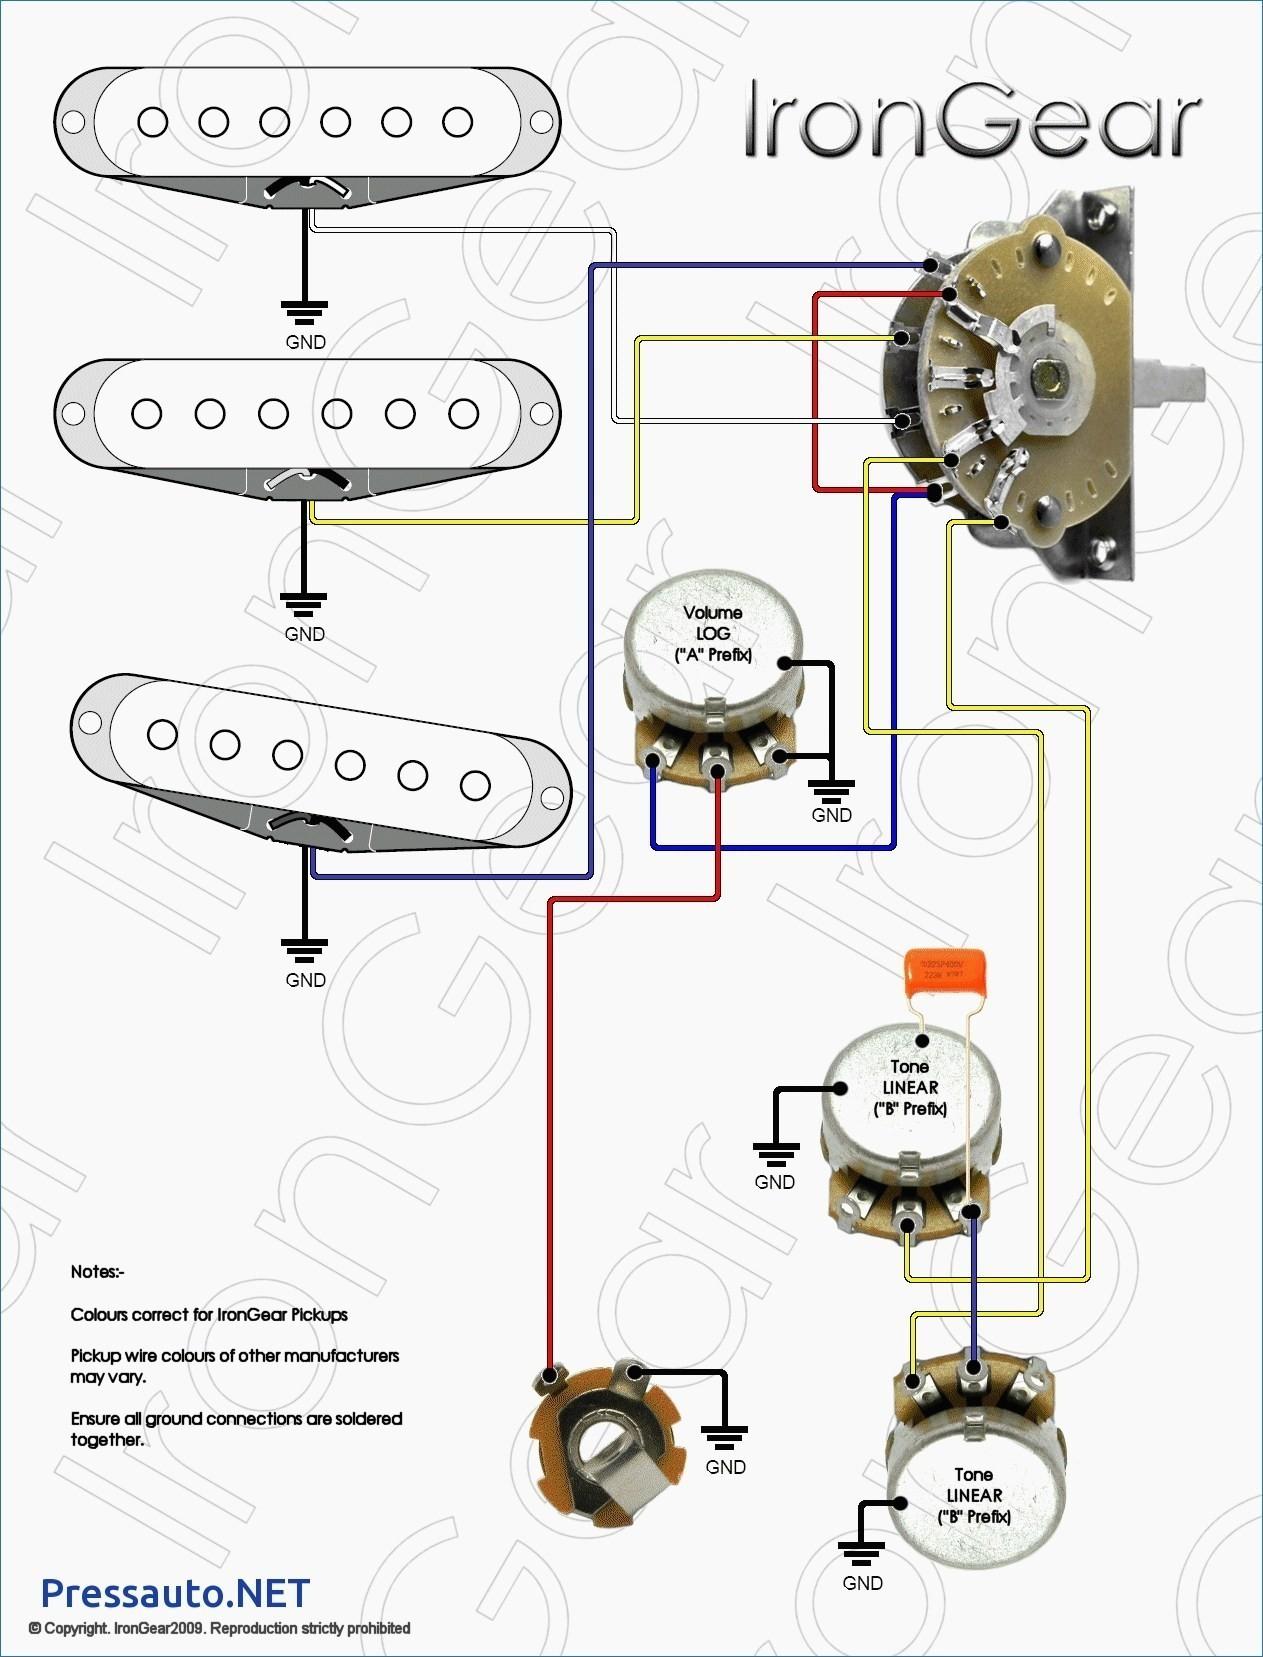 gretsch guitar wiring diagram valid wiring diagram guitar jack save wiring  diagram wiring diagram guitar